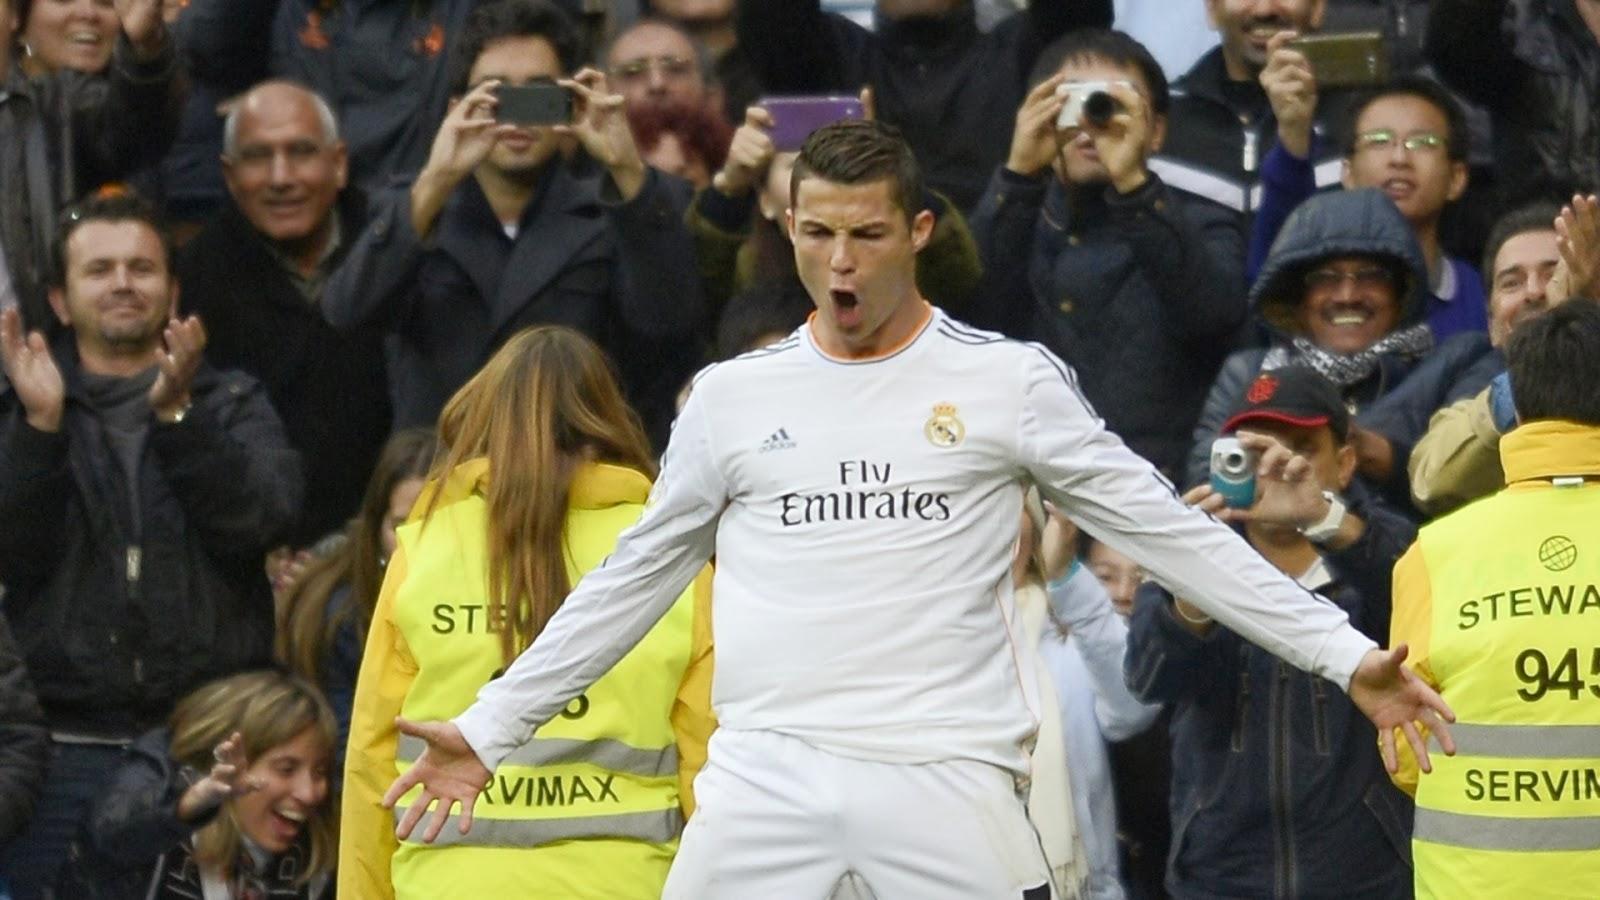 Cristiano Ronaldo Football Player Latest HD Wallpapers